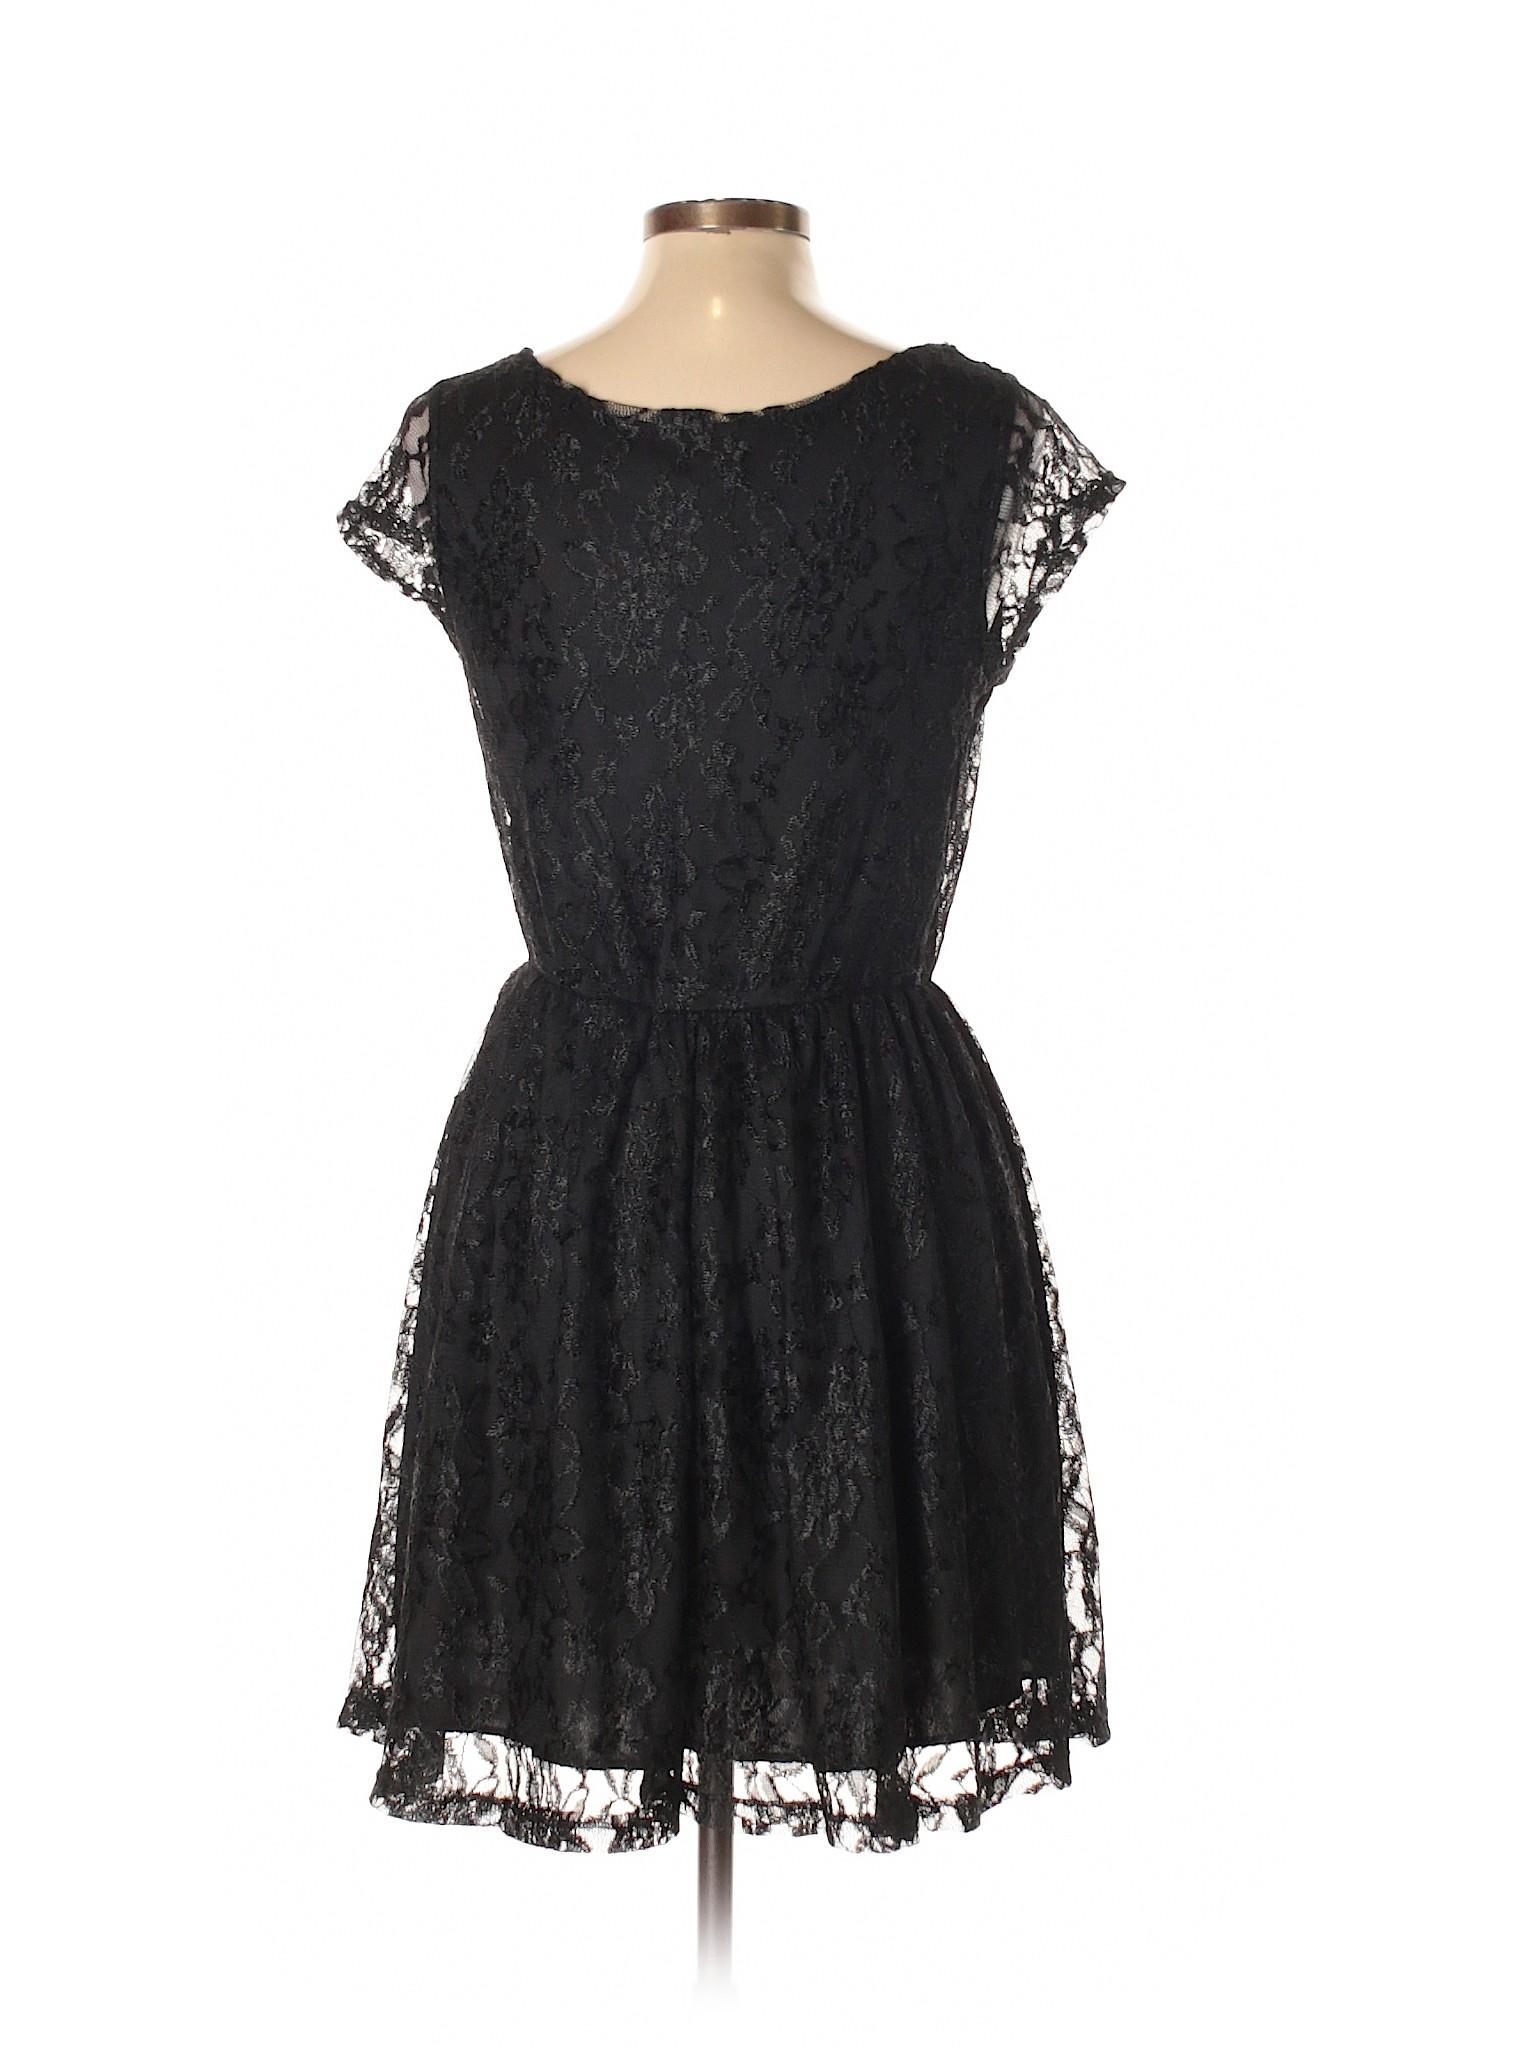 winter Casual Casual Boutique Minty Dress winter Minty Boutique Casual winter Minty Dress Boutique Dress W1W0qg